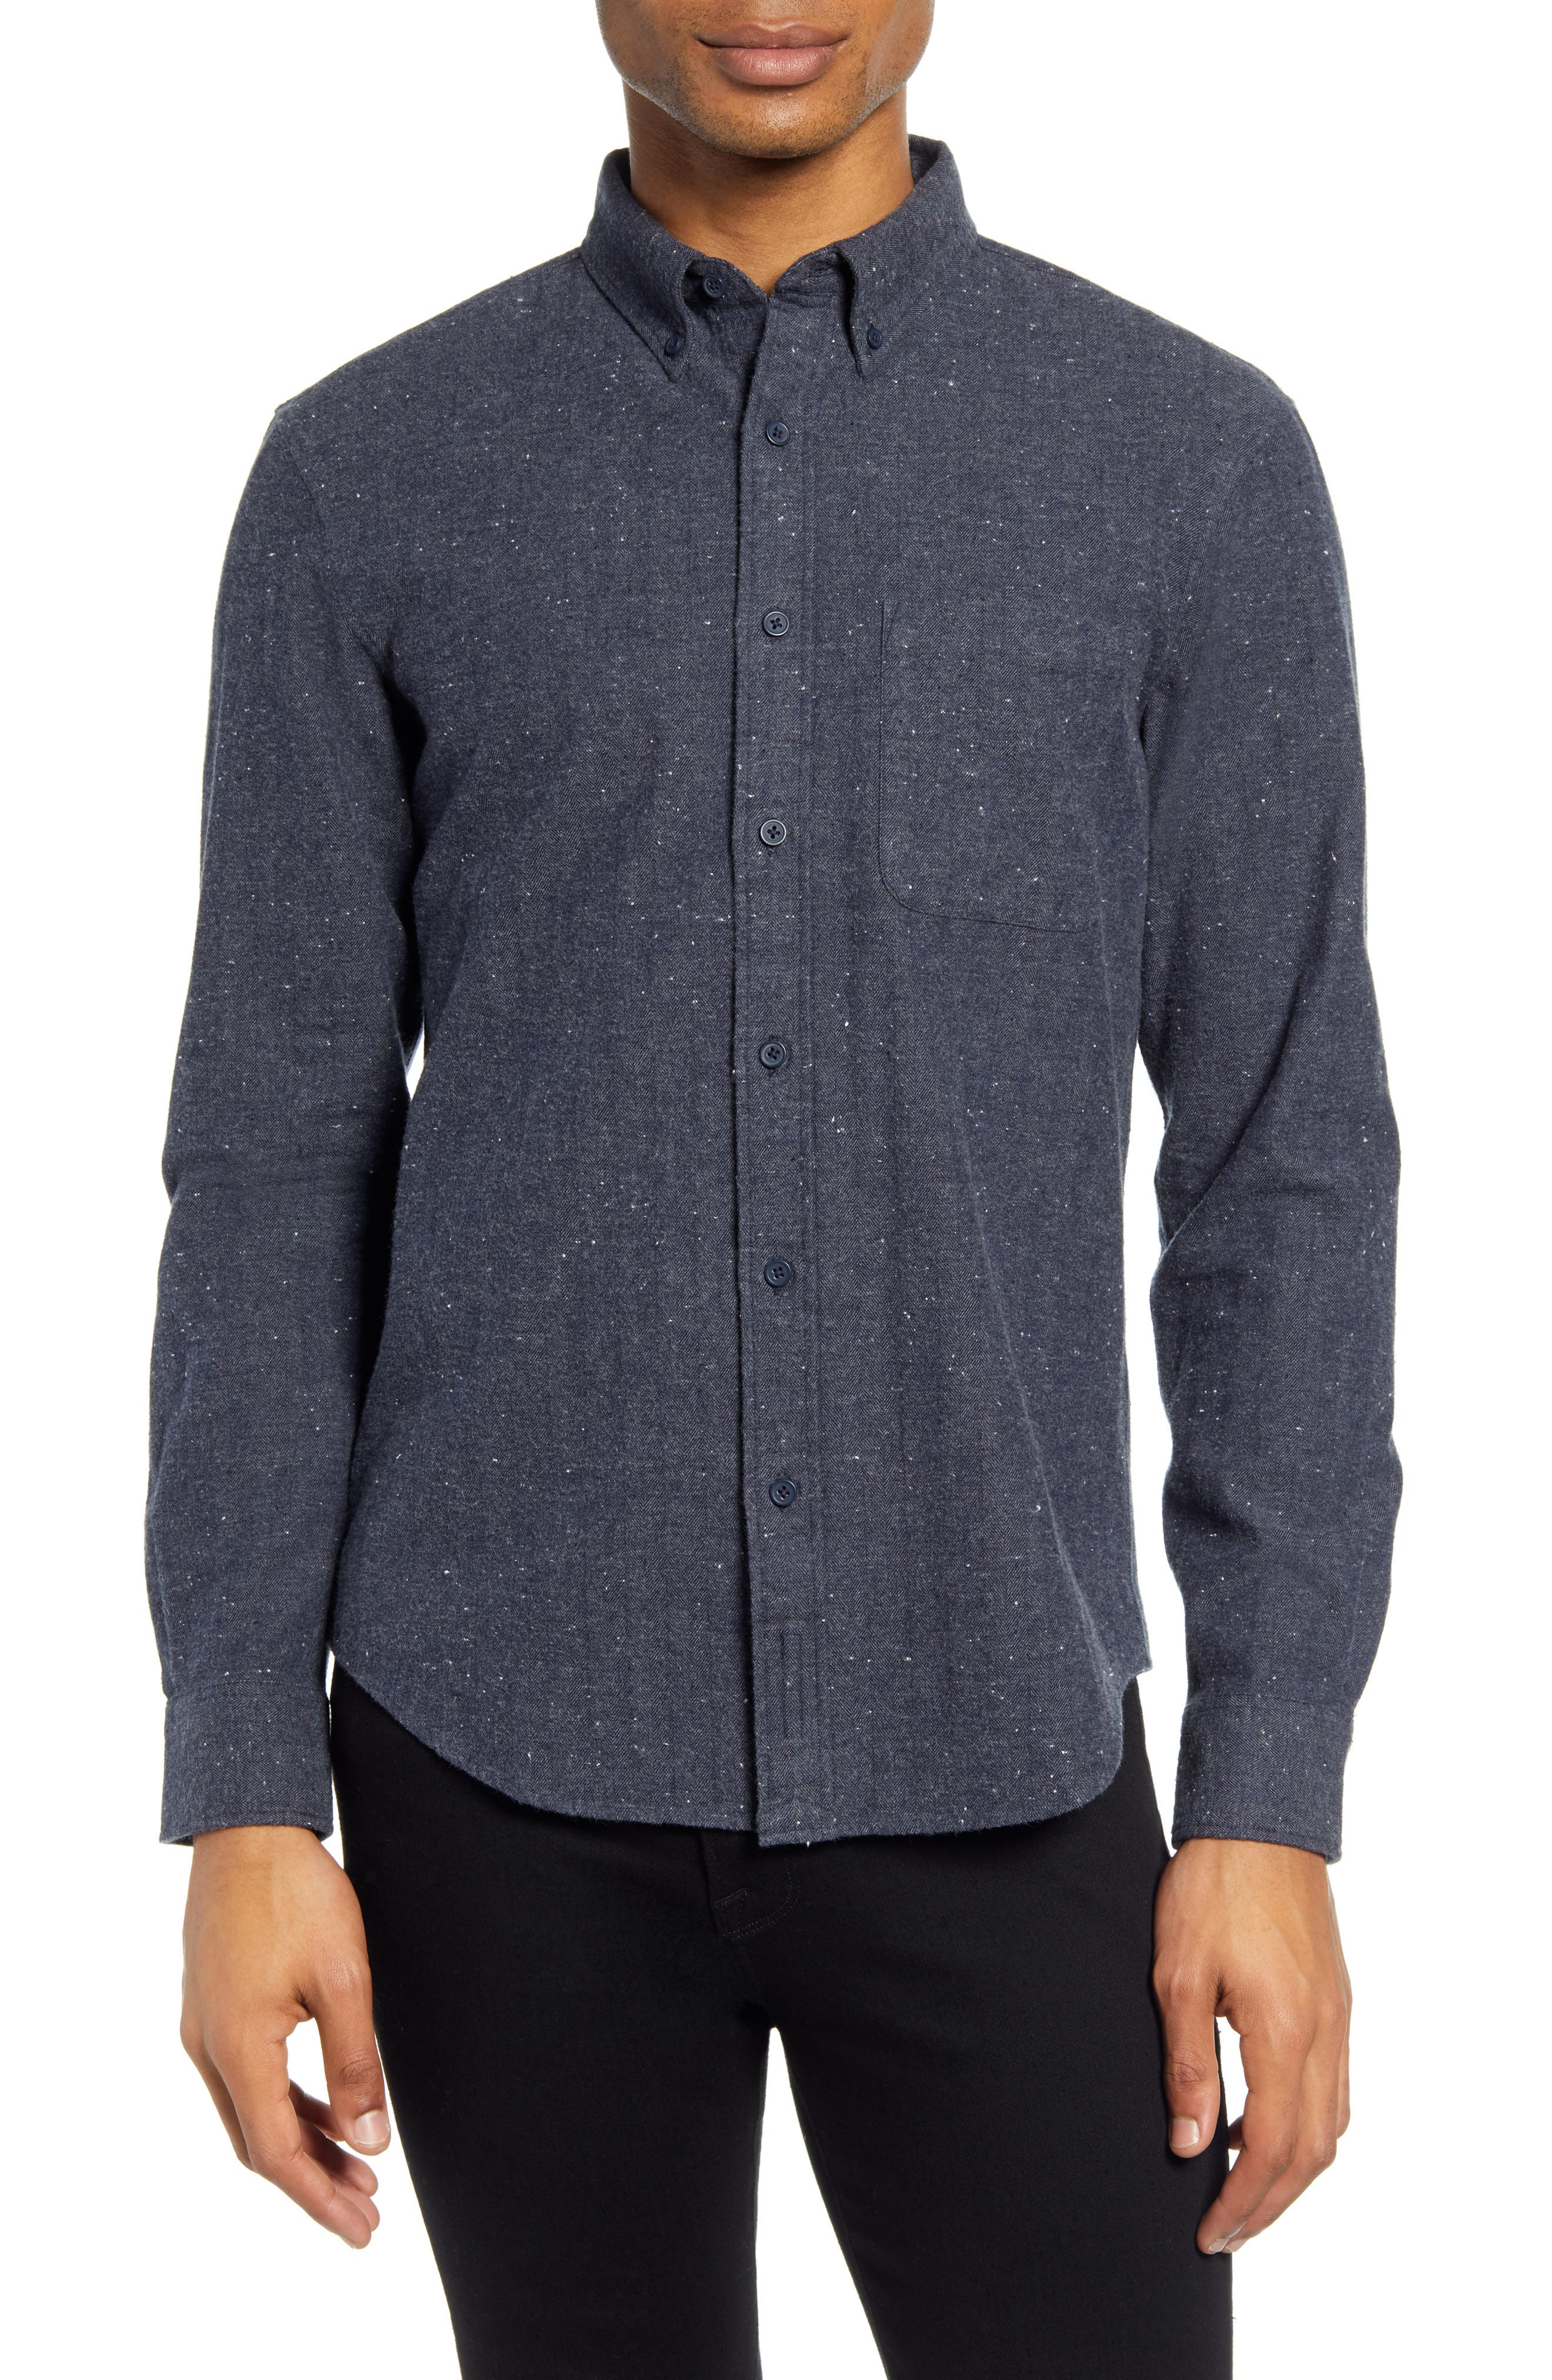 Image of CLUB MONACO Slim Fit Donegal Herringbone Button-Down Shirt